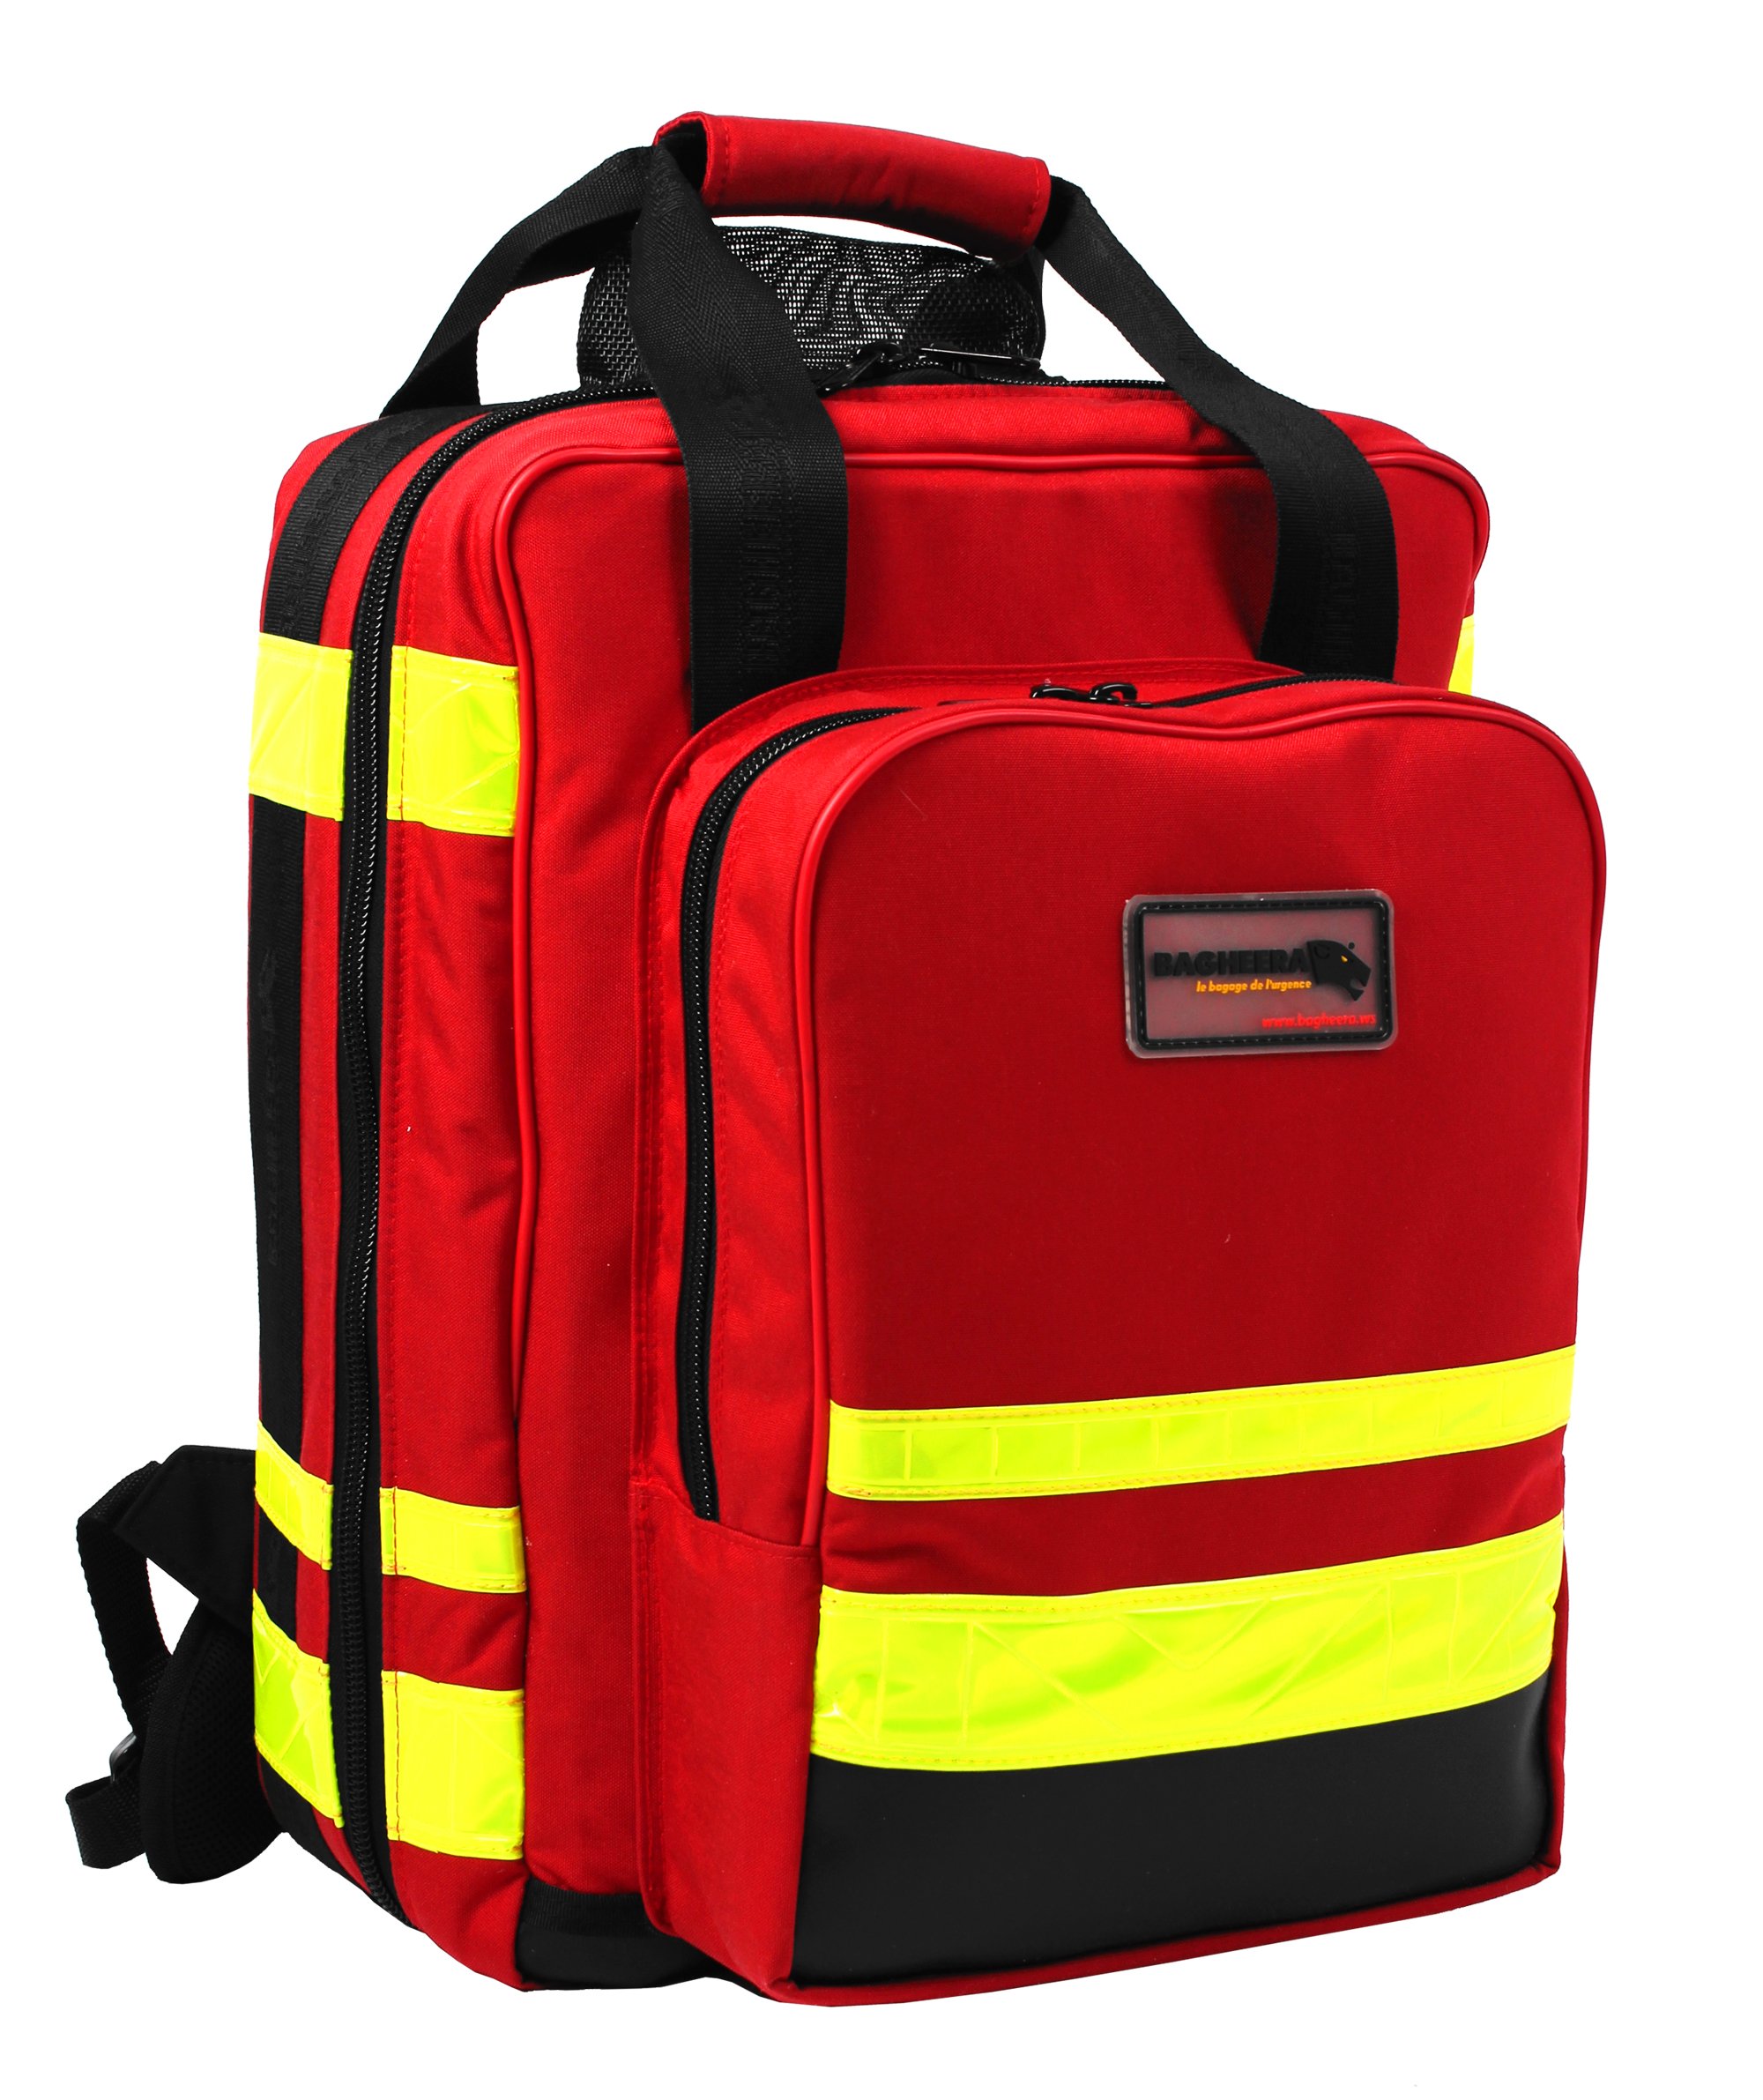 City Väskan : ?nge city akutv?rdsv?ska set help rescue